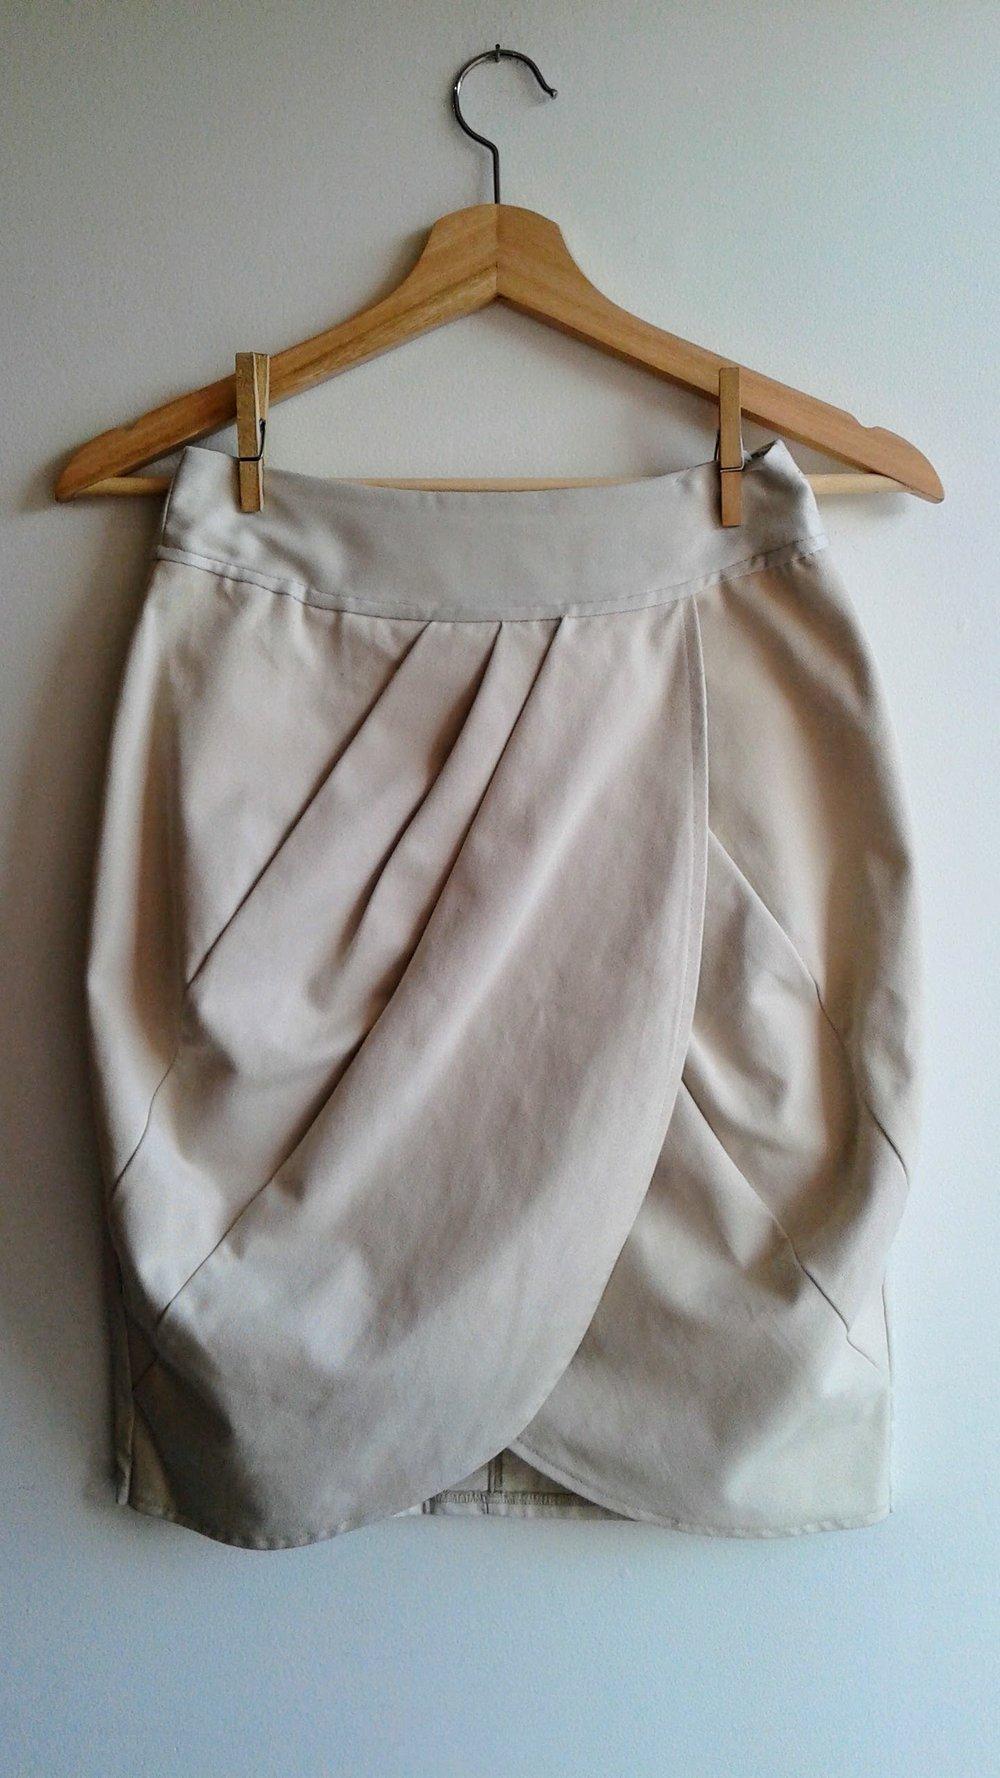 Preloved skirt; Size XS, $30